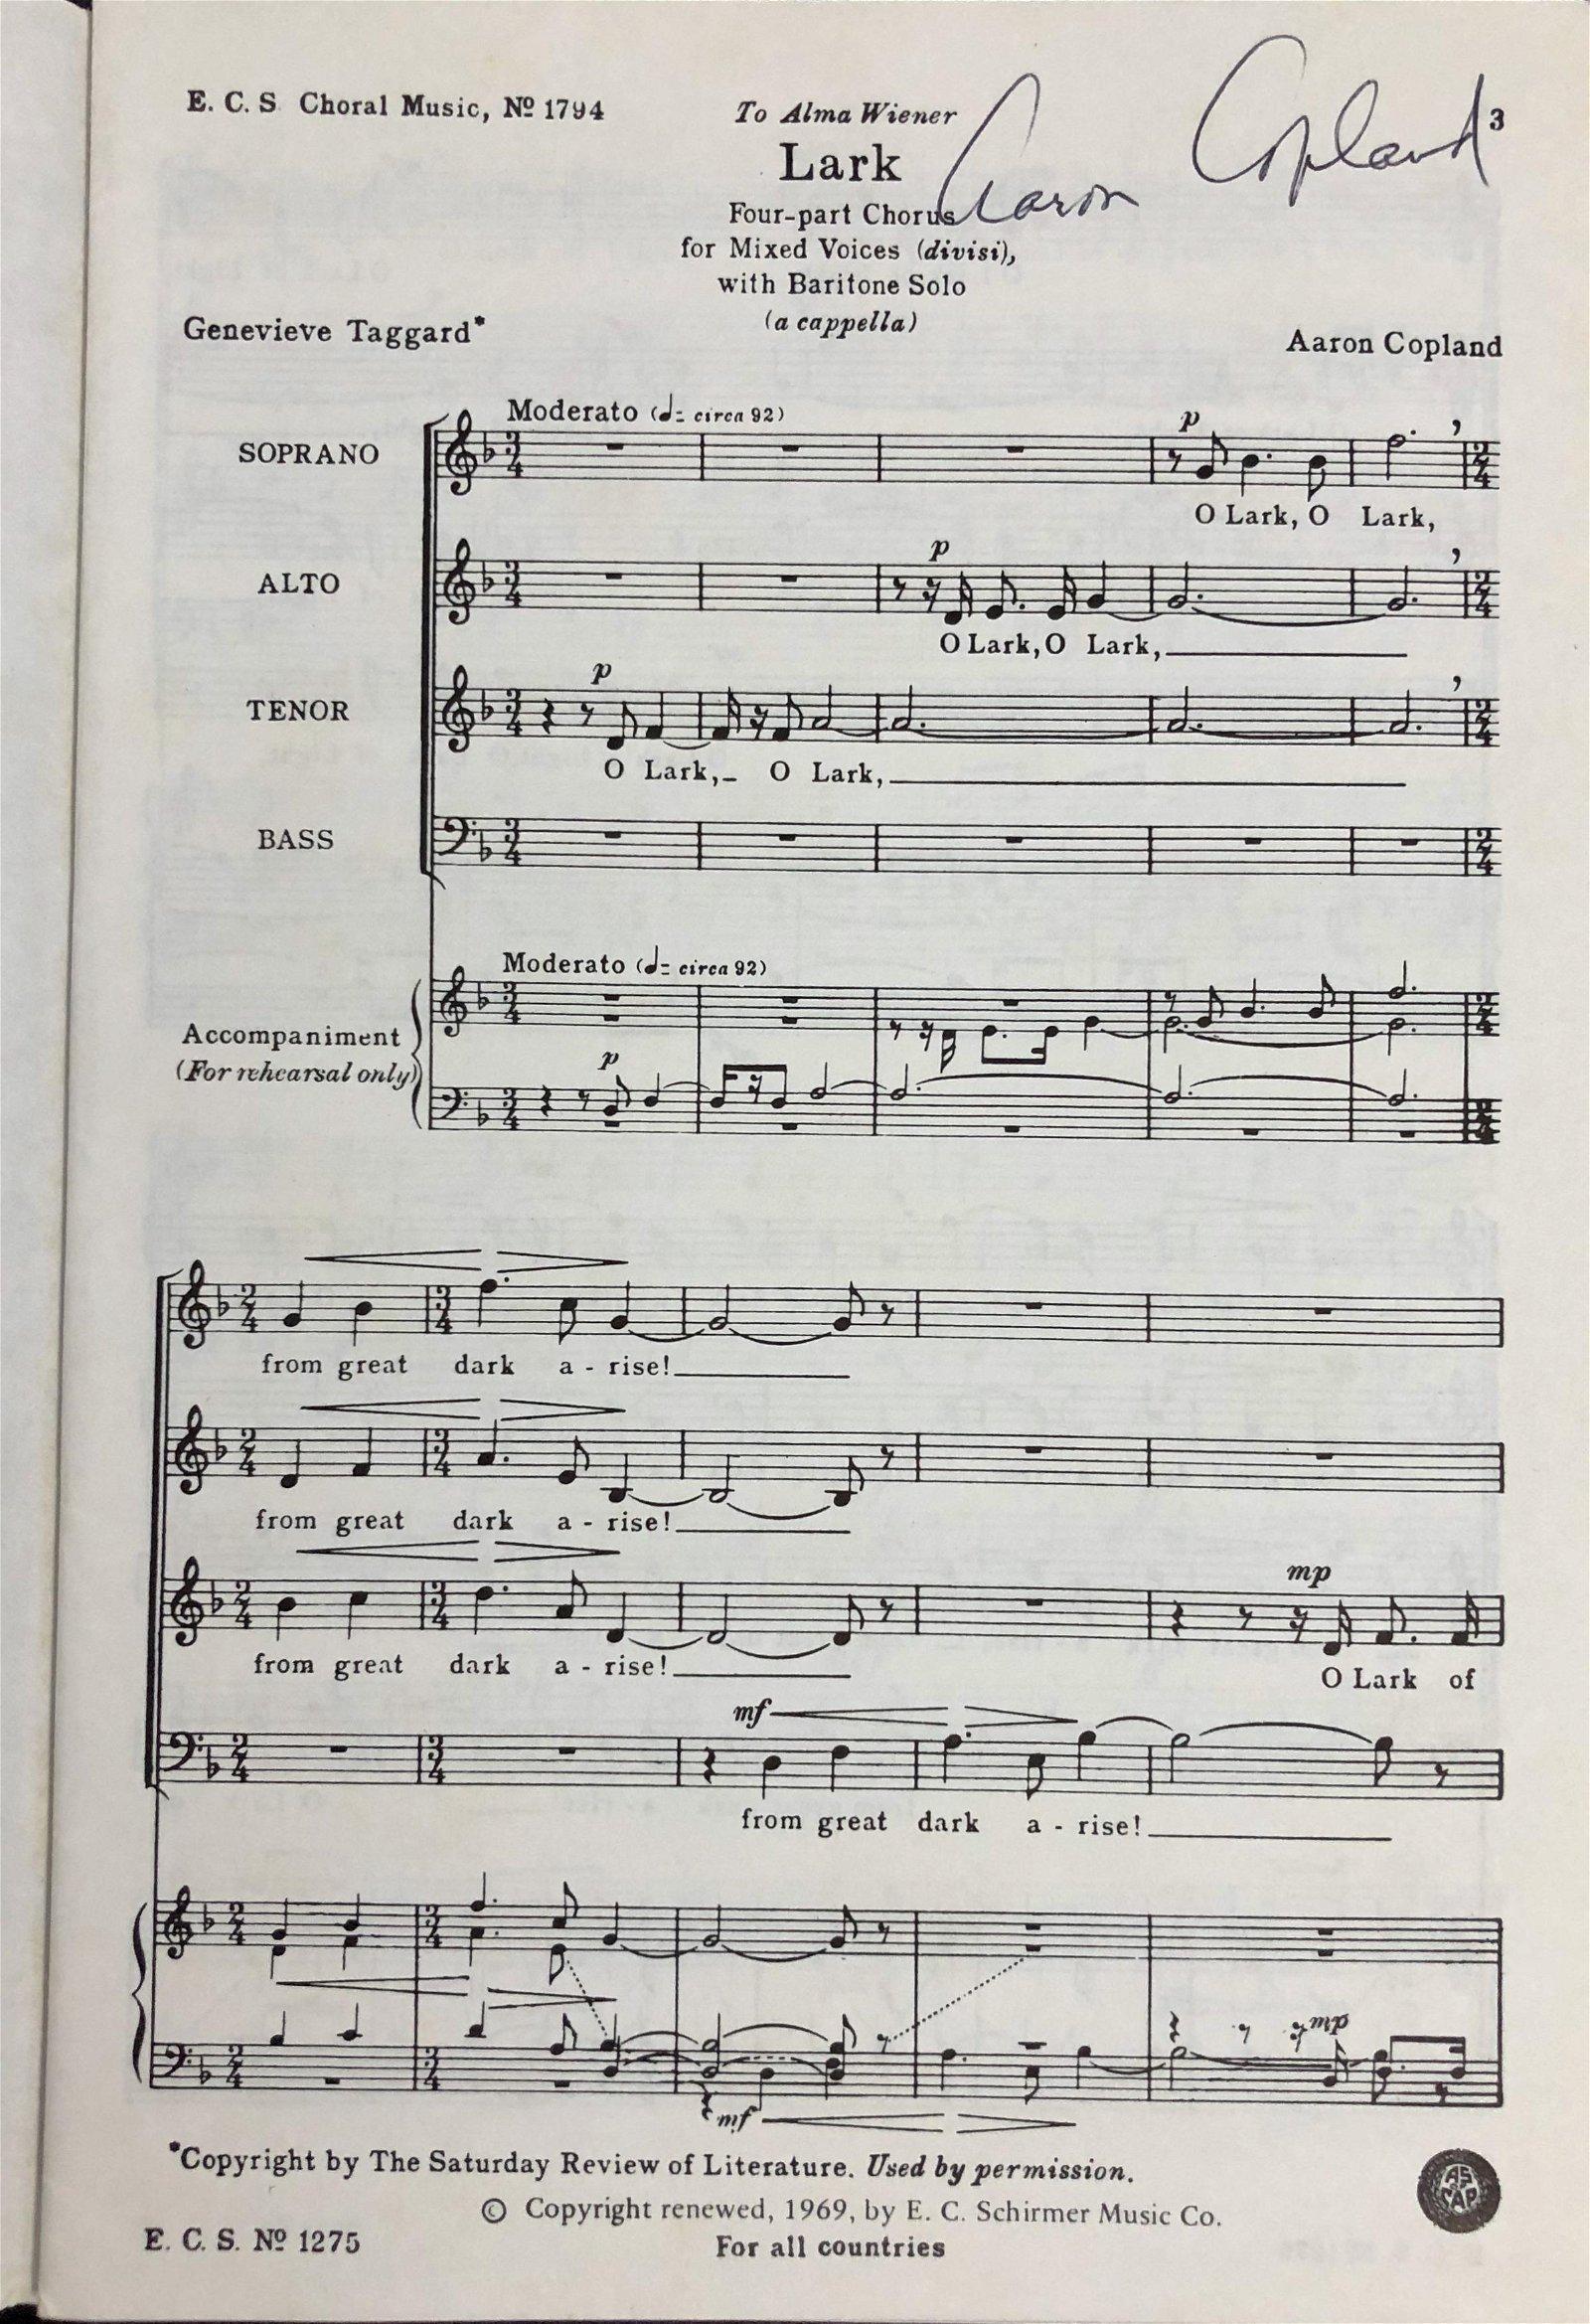 Aaron Copland Hand-Signed Music Score: LARK  1969